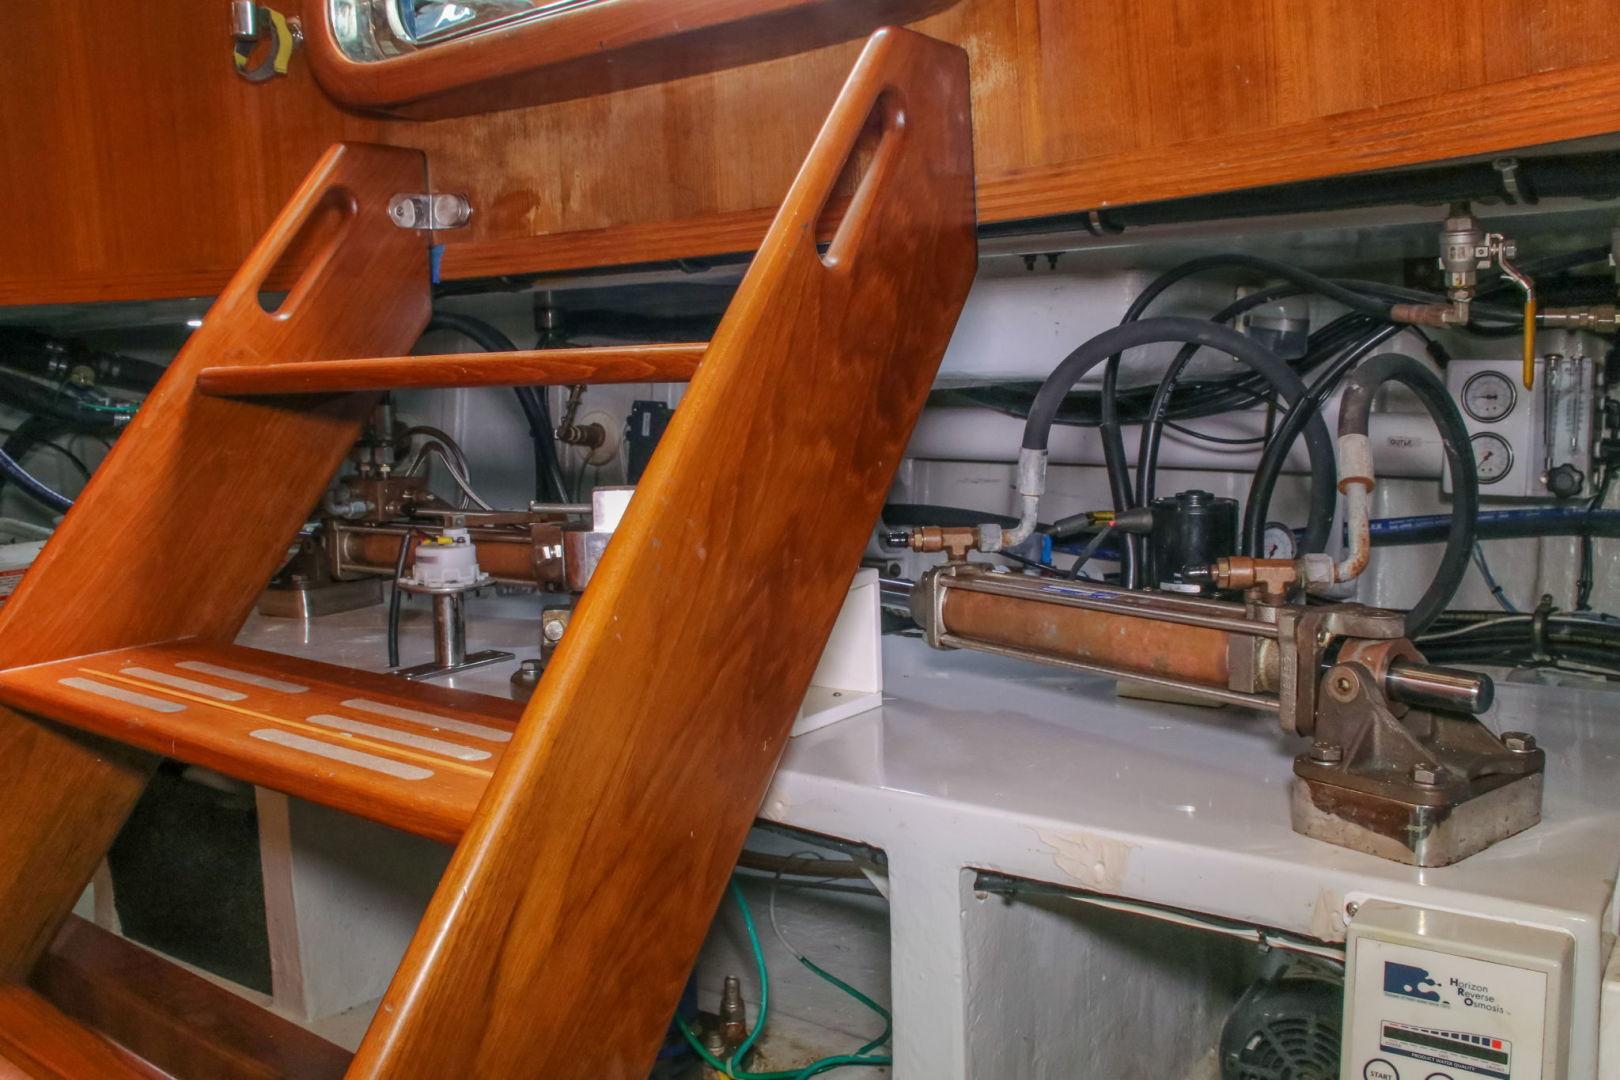 Selene-60 Ocean Trawler 2010-Gypsy Magic Jacksonville-Florida-United States-Lazarette-1346778   Thumbnail